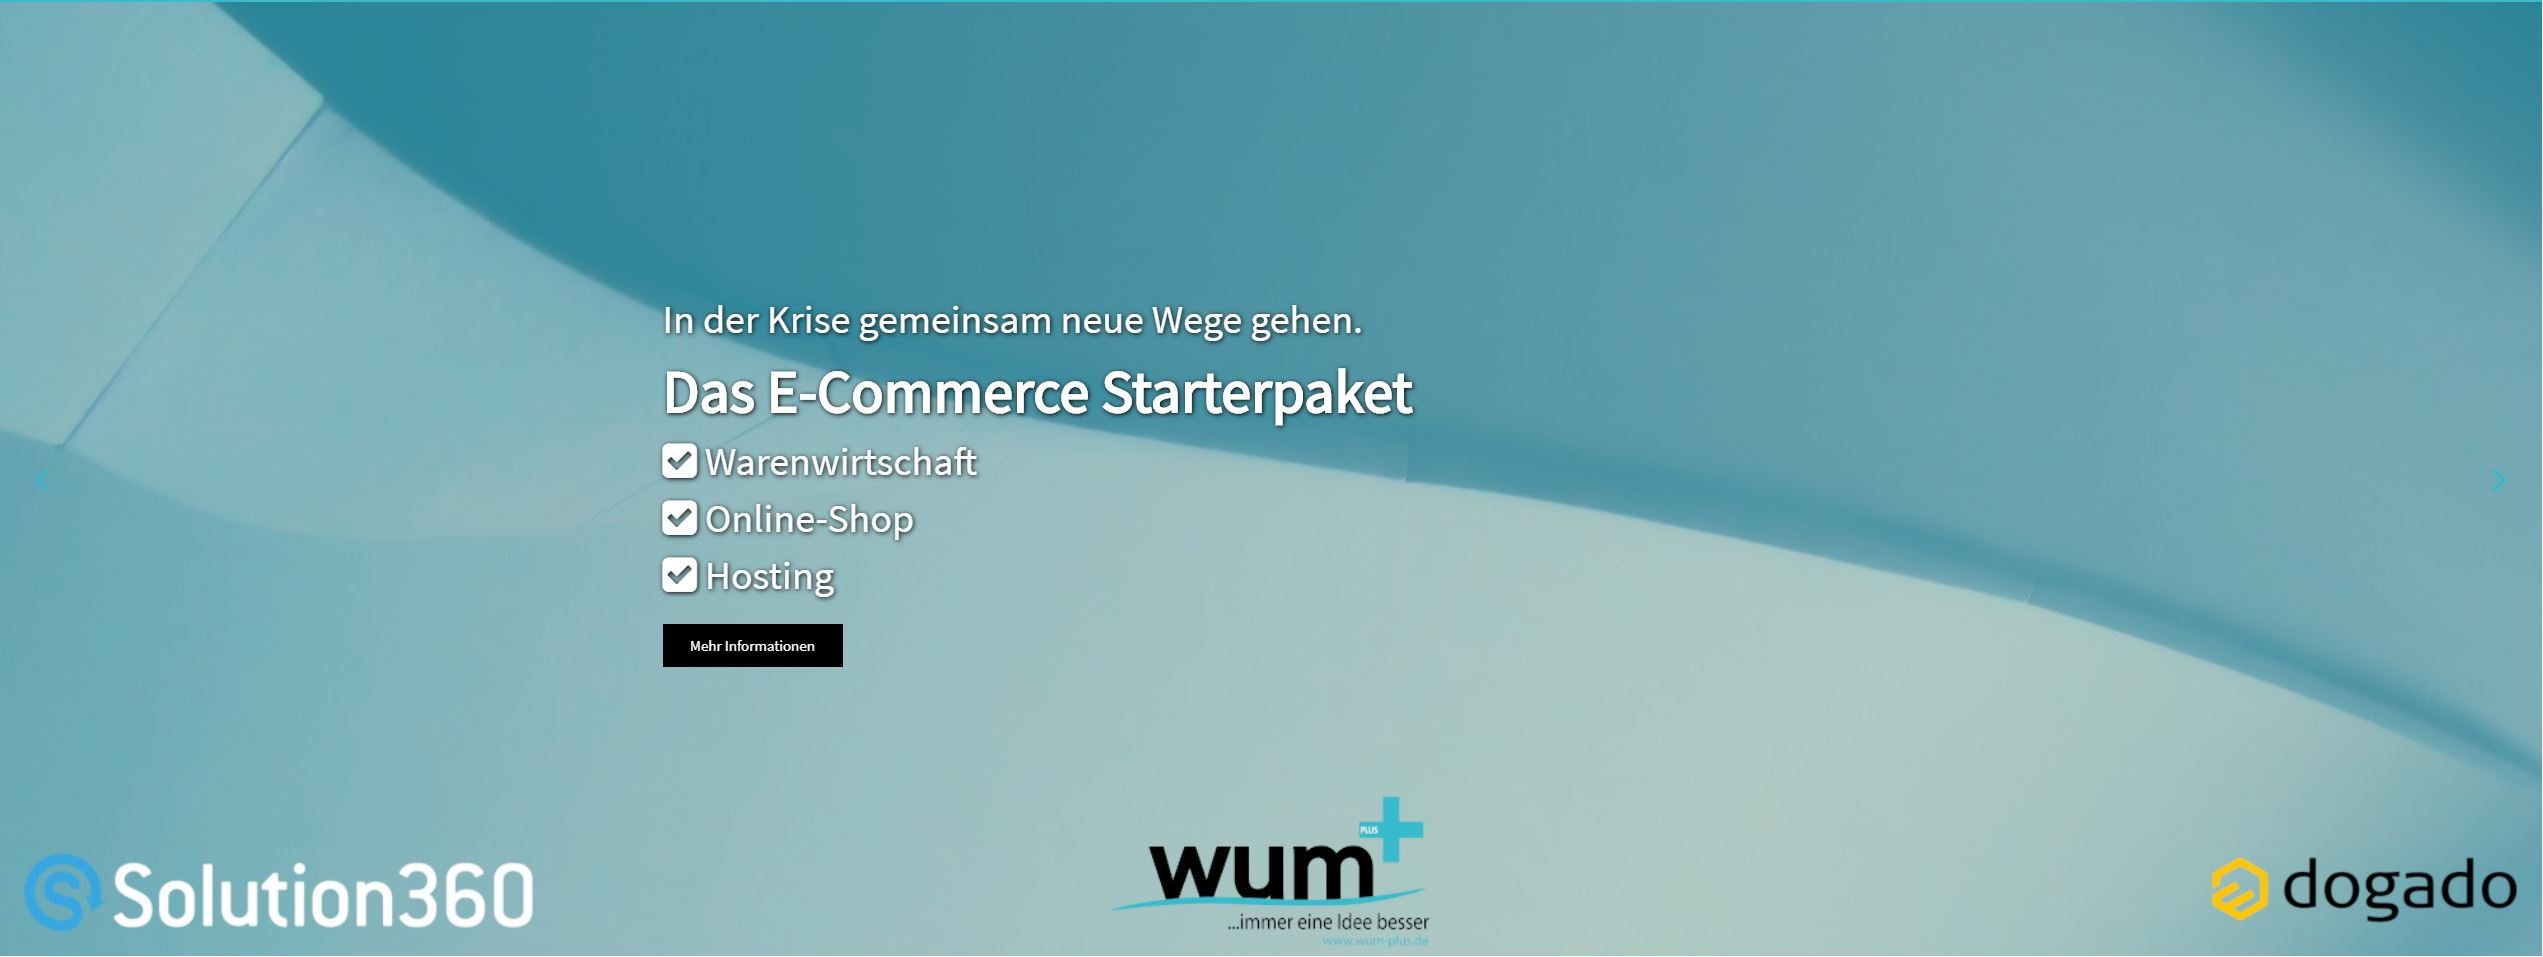 Krisenhilfe - Das E-Commerce Starterpaket